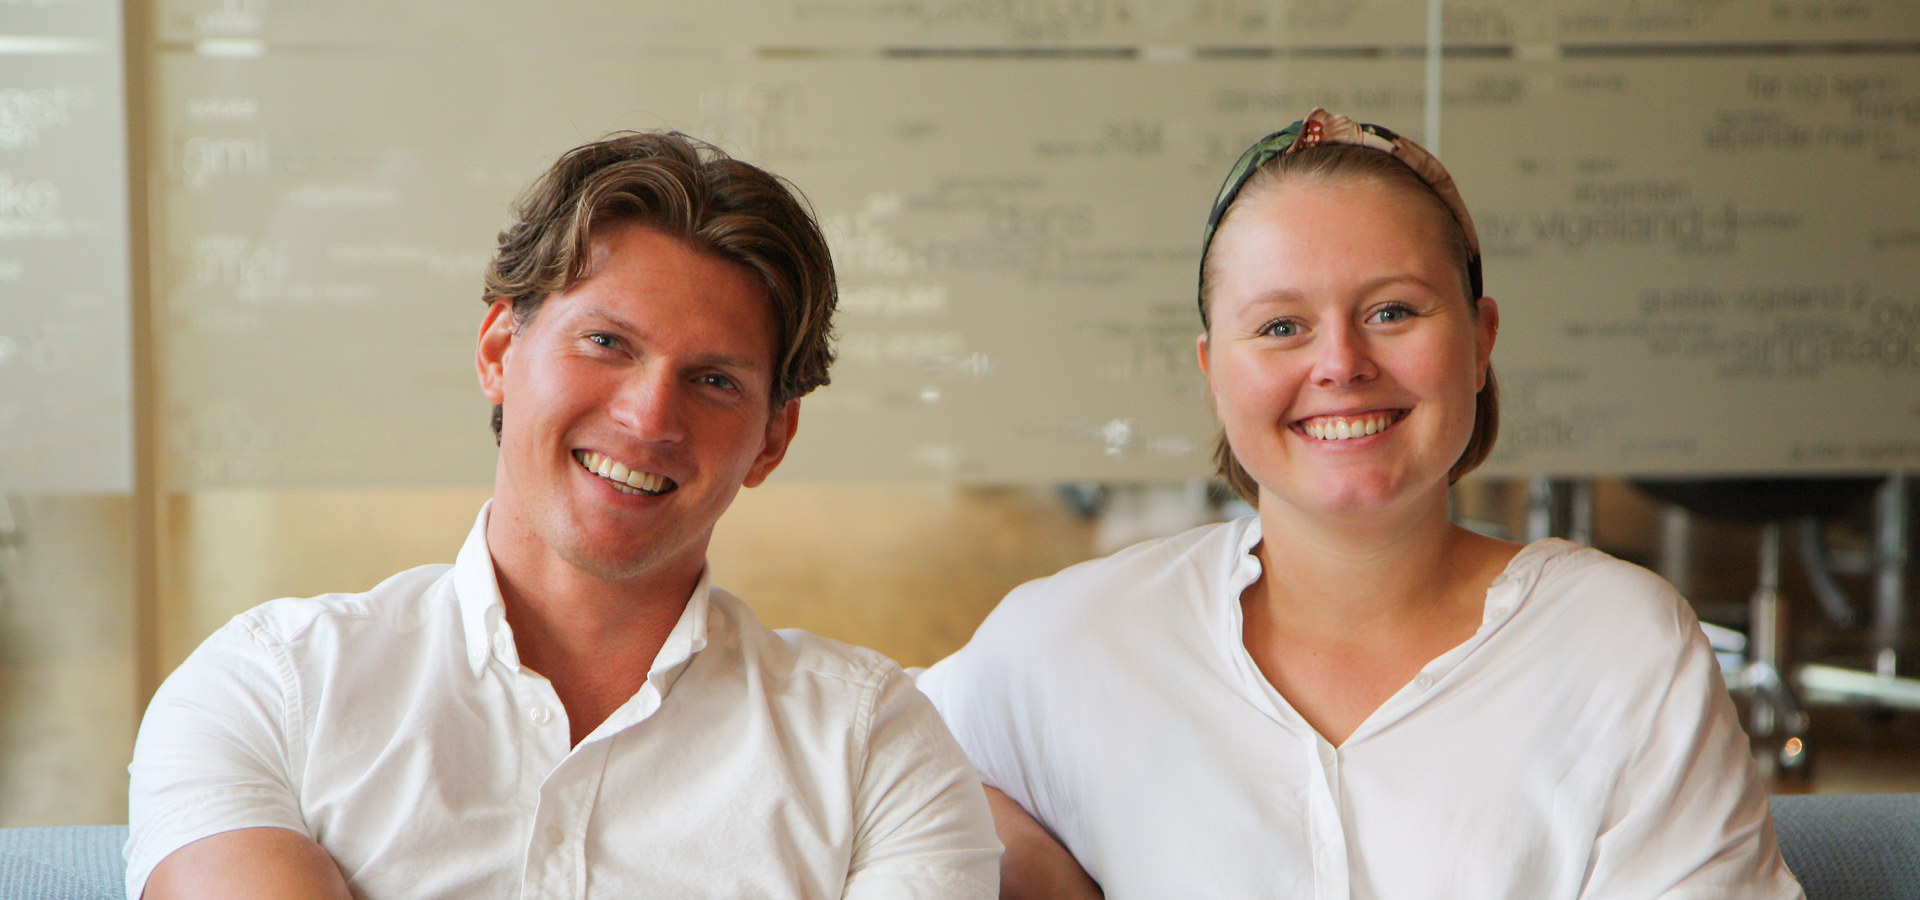 Designstipend 2019. Tobias Berg og Vilde Hagelund.